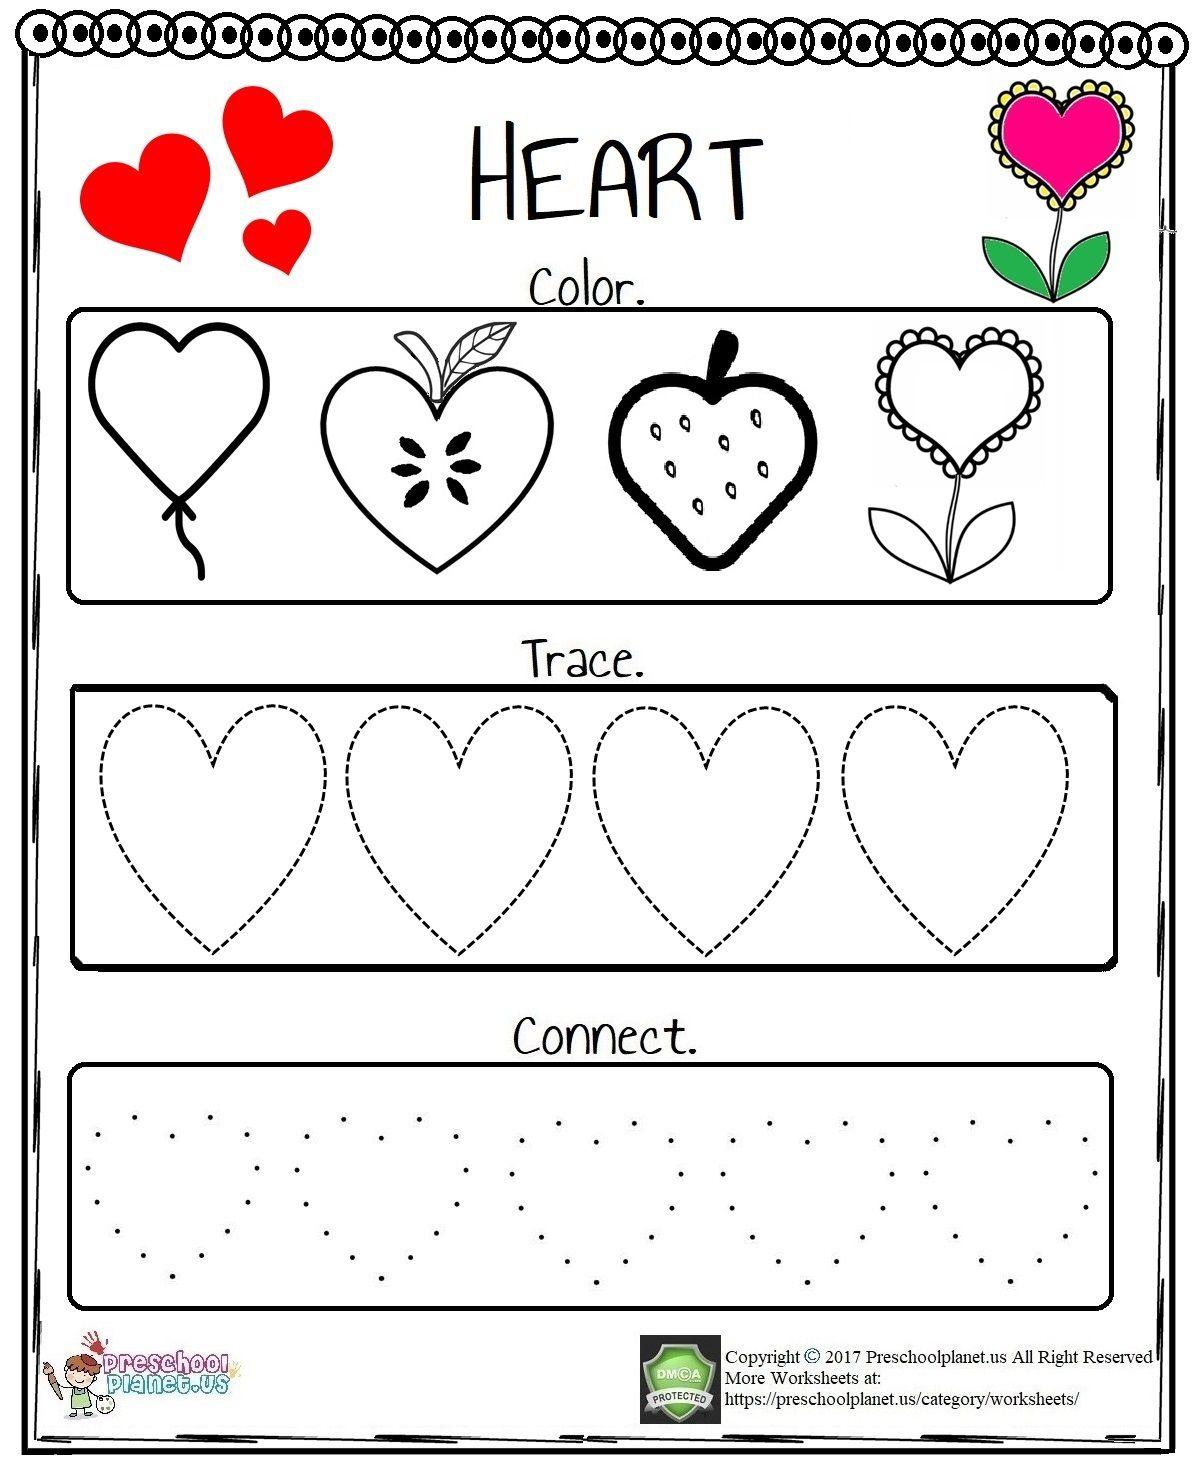 Heart Tracing Worksheet Free